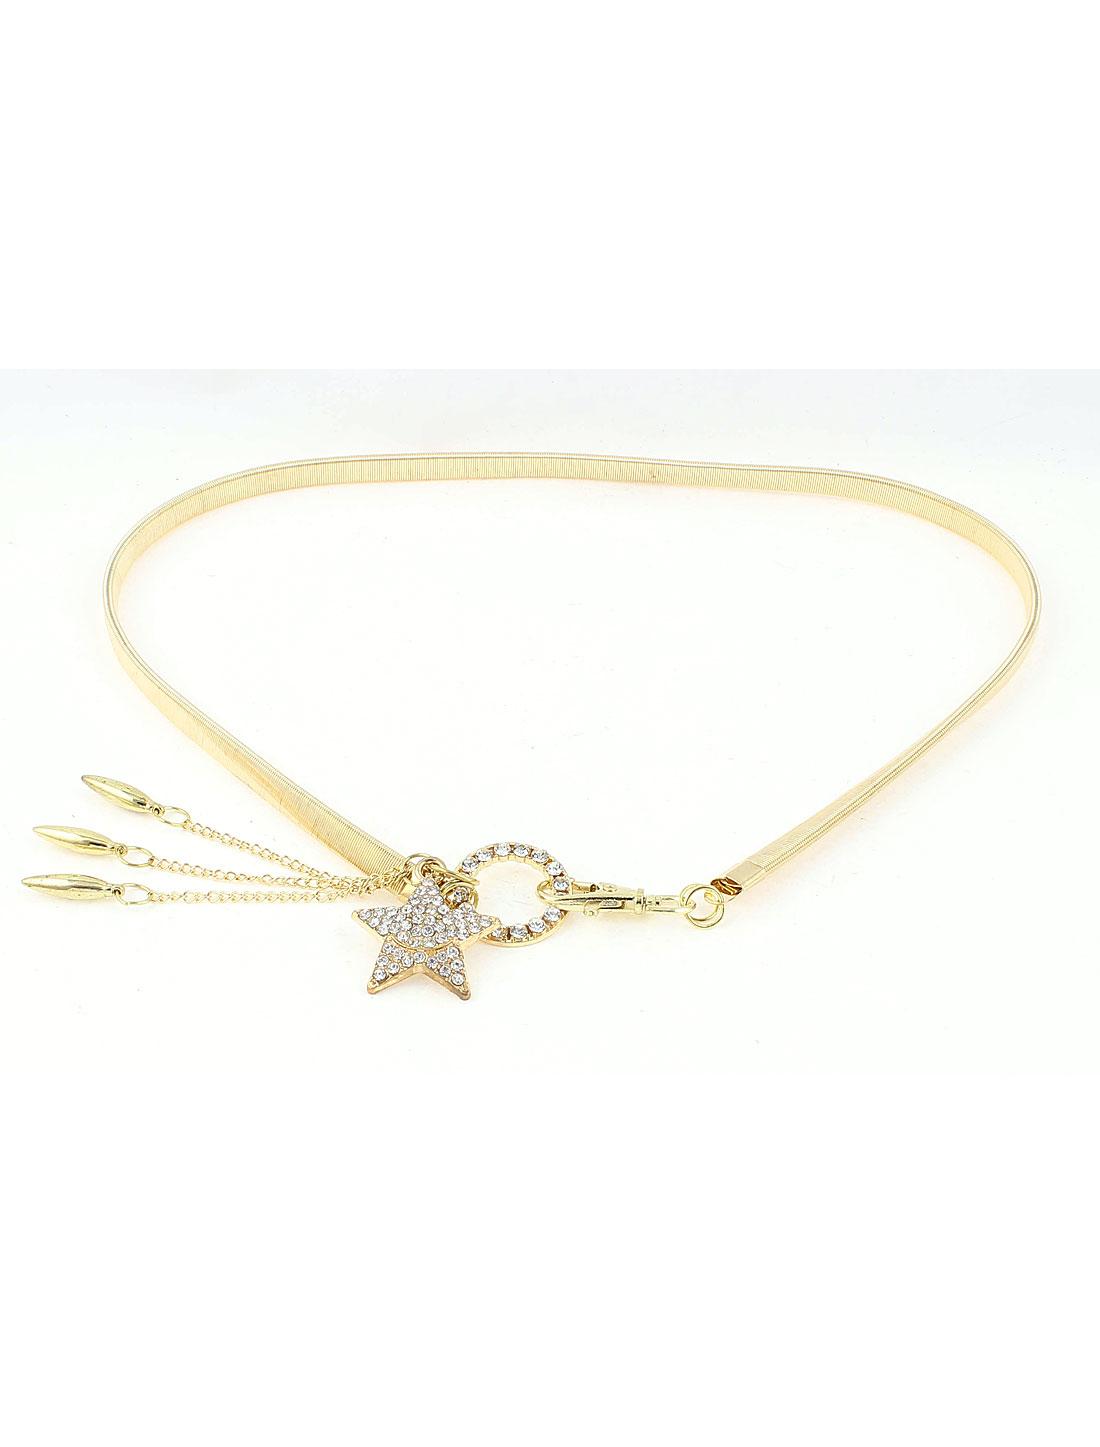 Woman Blouse Dress Match Lobster Buckle Rhinestone Inlaid Star Circle Gold Tone Metal Elastic Waistbelt Waist Belt Chain